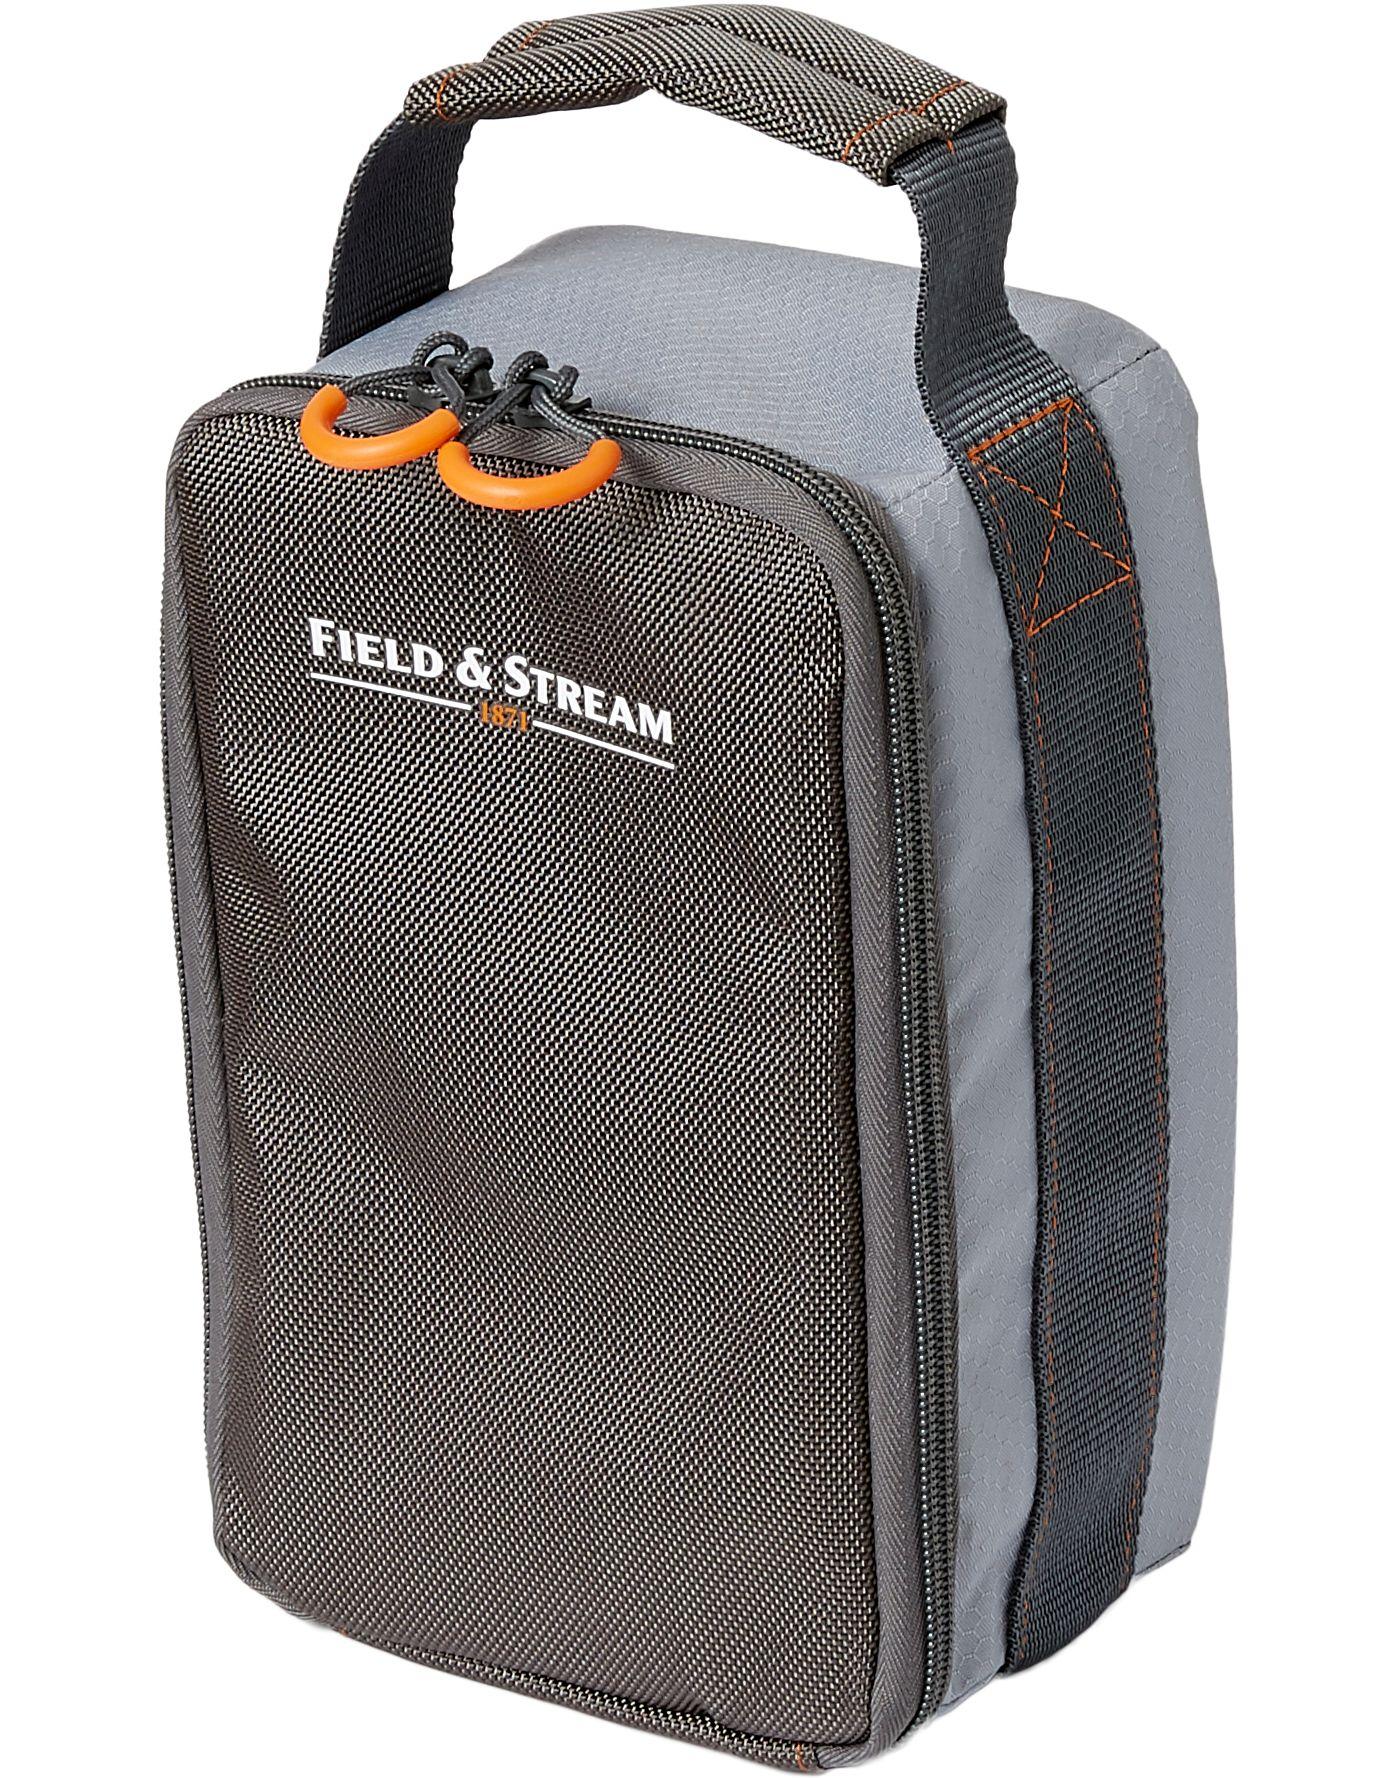 Field & Stream Pro Reel Case | DICK'S Sporting Goods